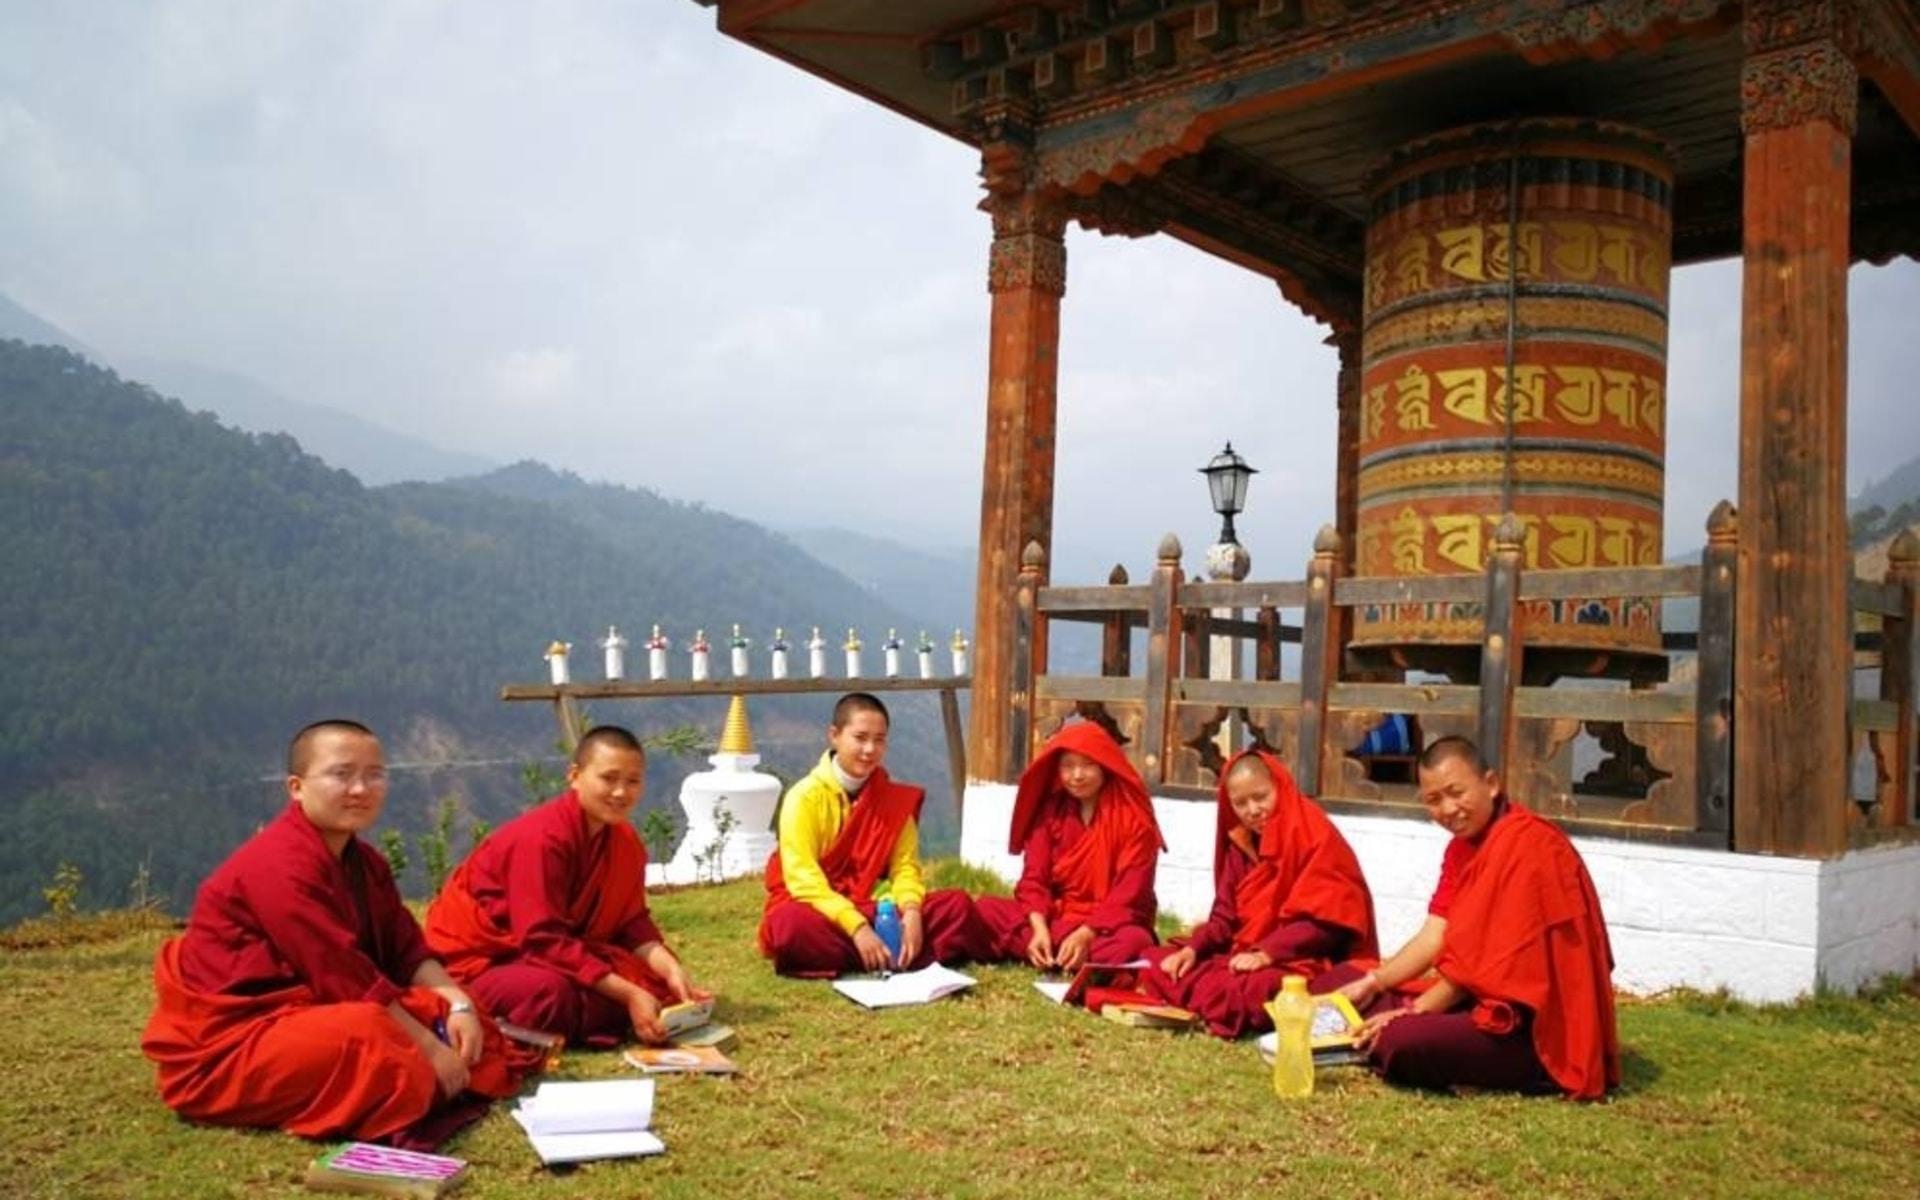 Sangchhen Droji Lhuendrup Lhakhang Nunnery